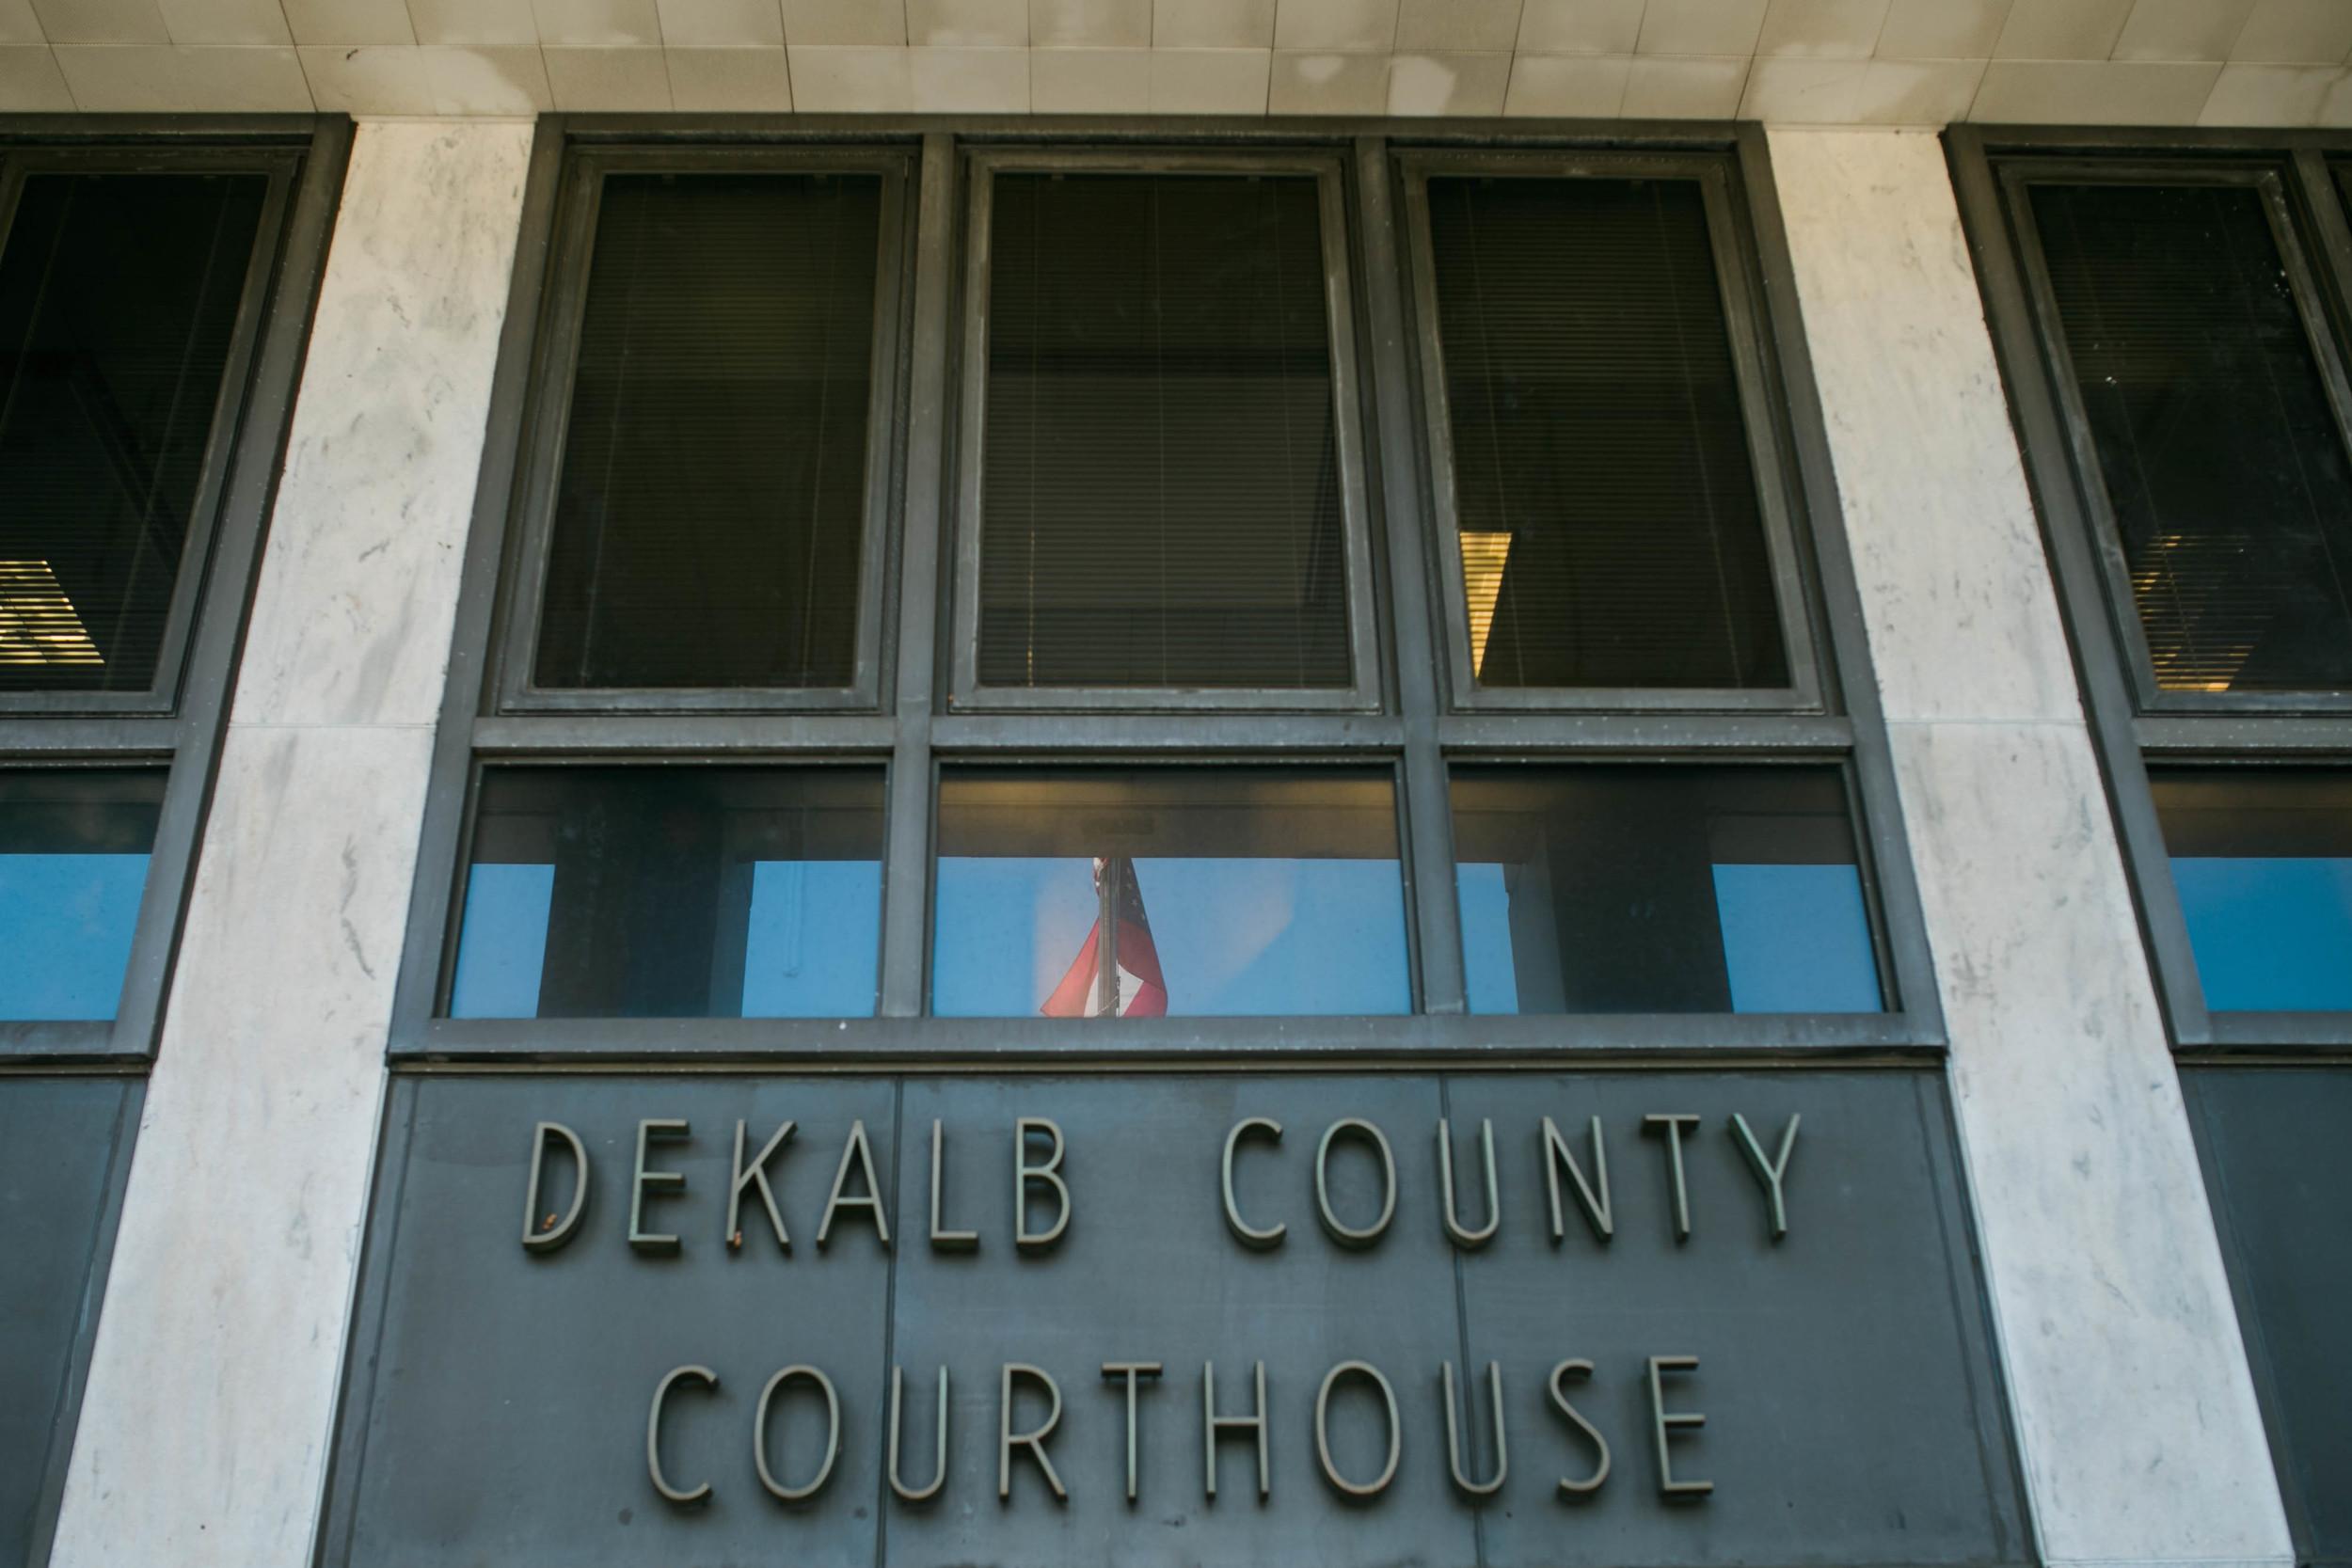 Dekalb-County-Courthouse-Wedding-Photos-Kiyah-C-Photography-30.jpg